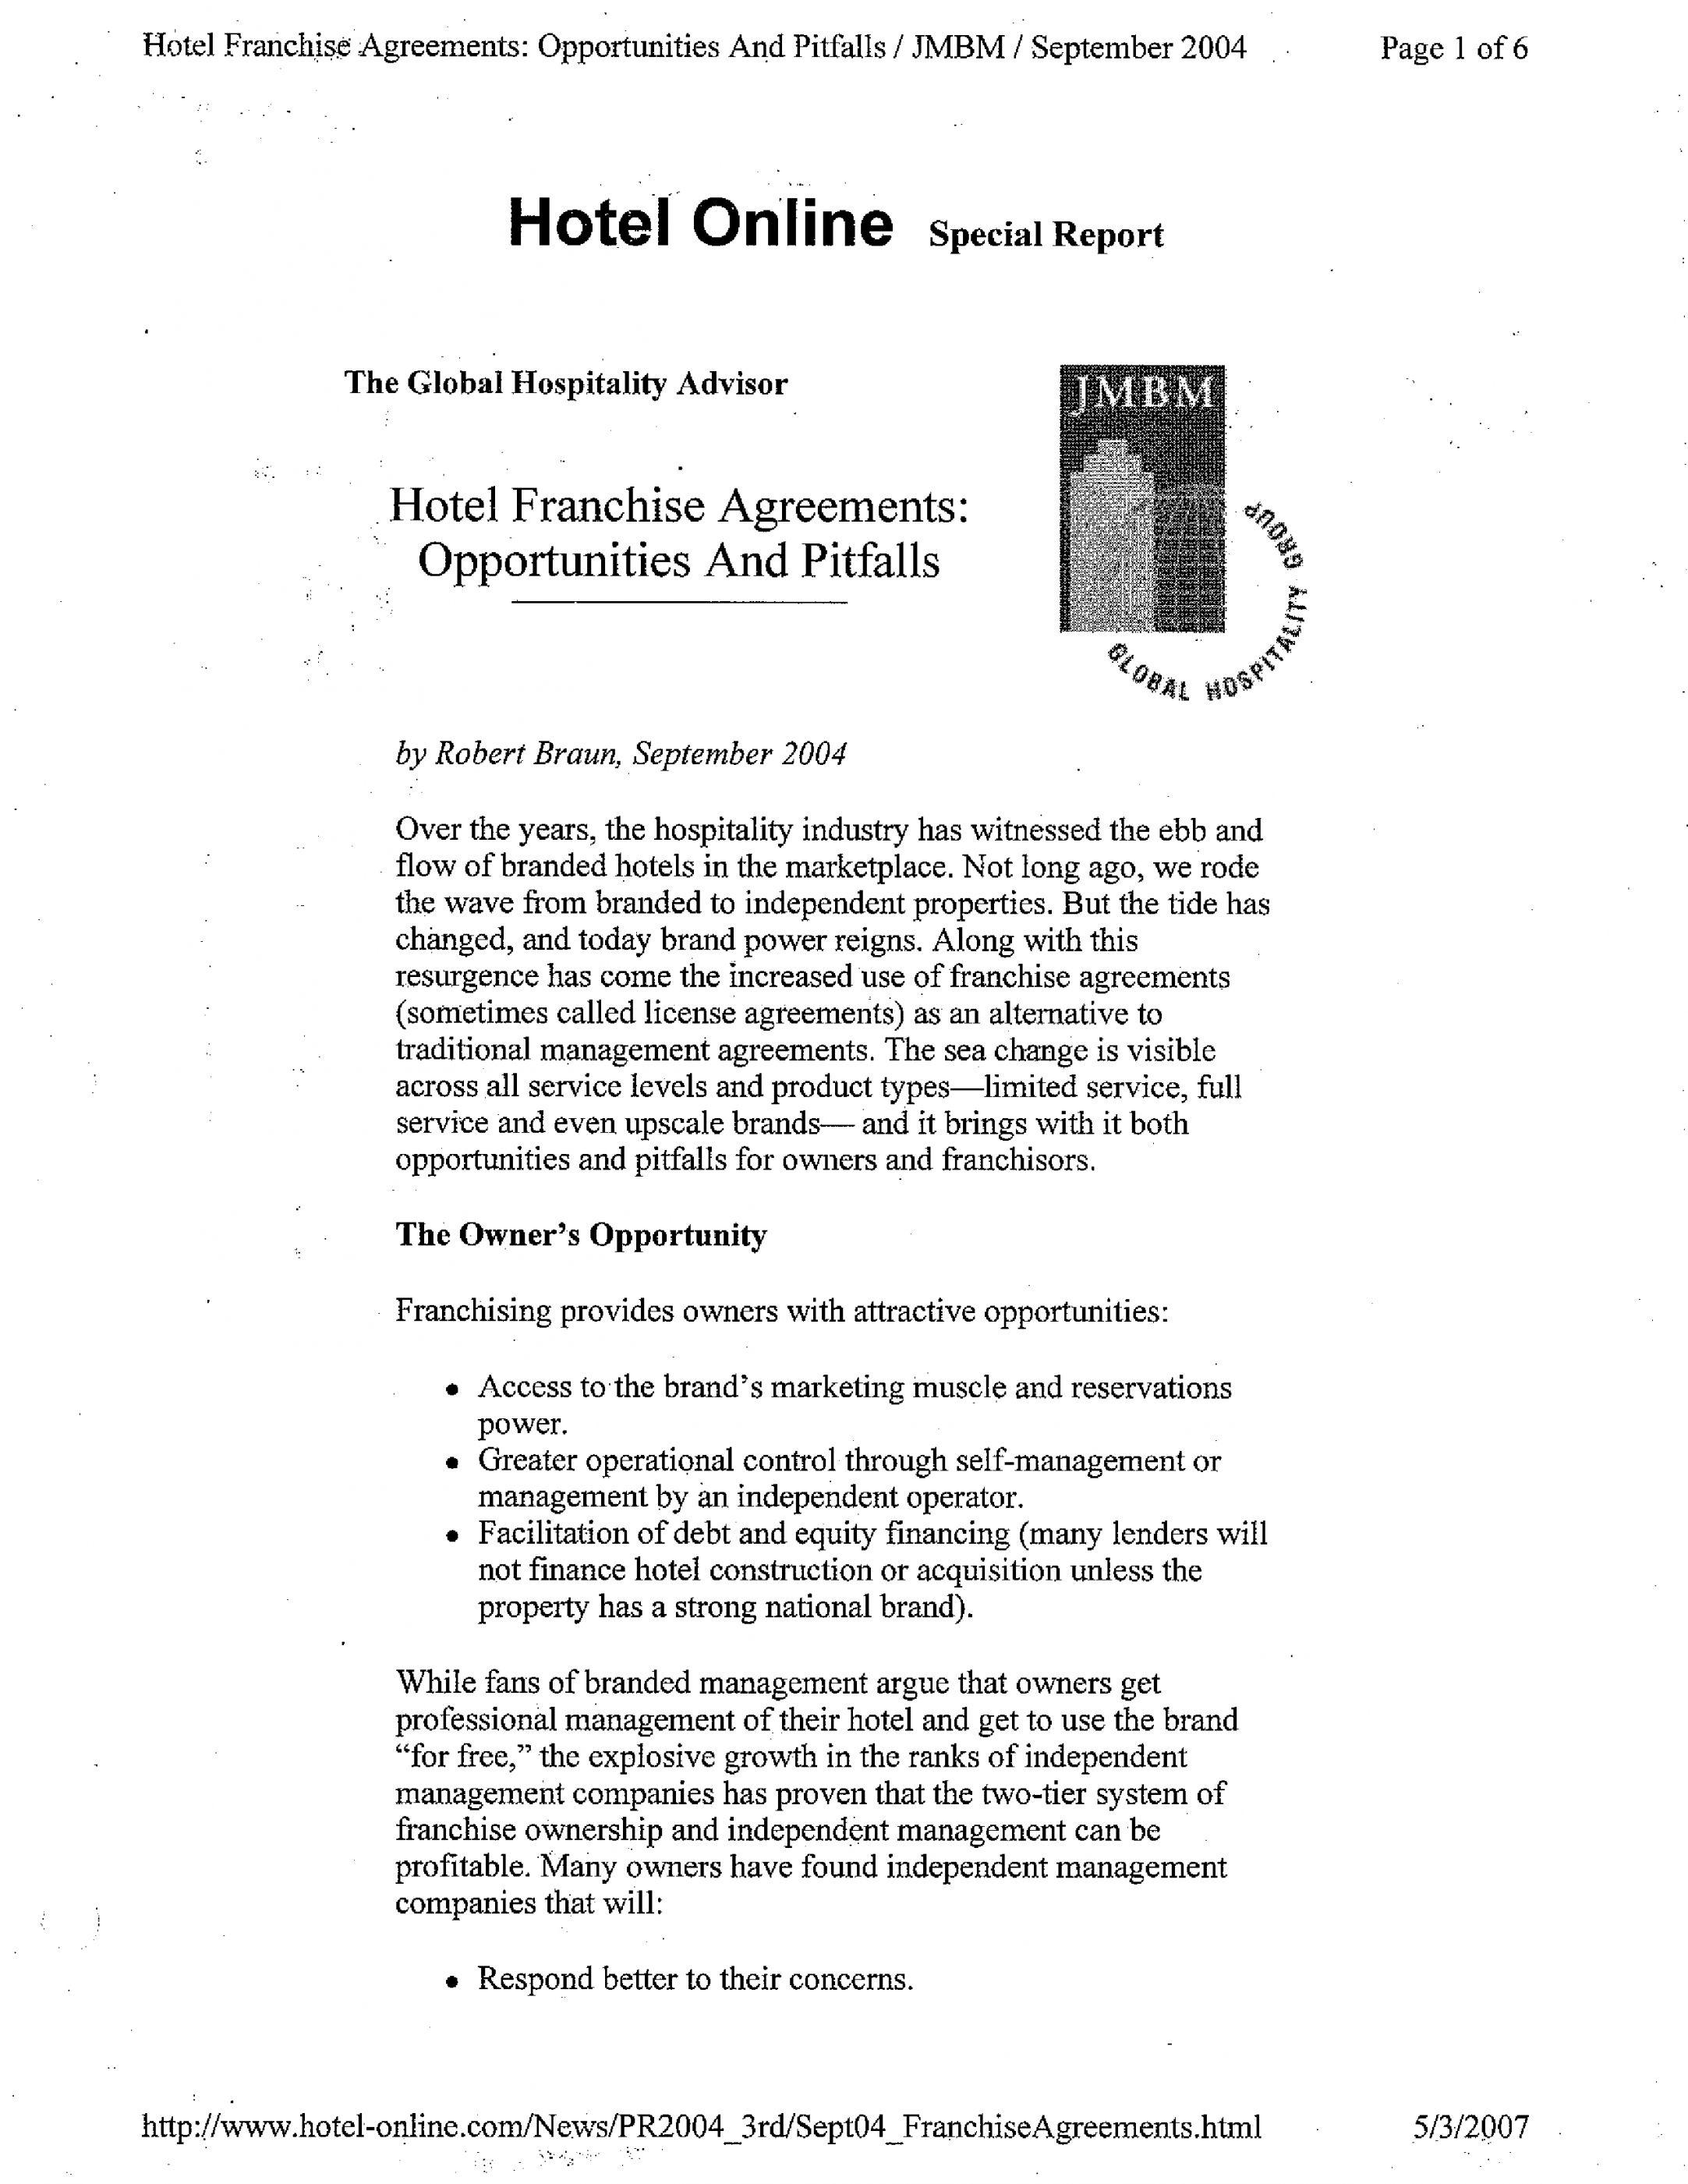 Hotel Franchise Agreement Sample In 2020 Franchise Agreement